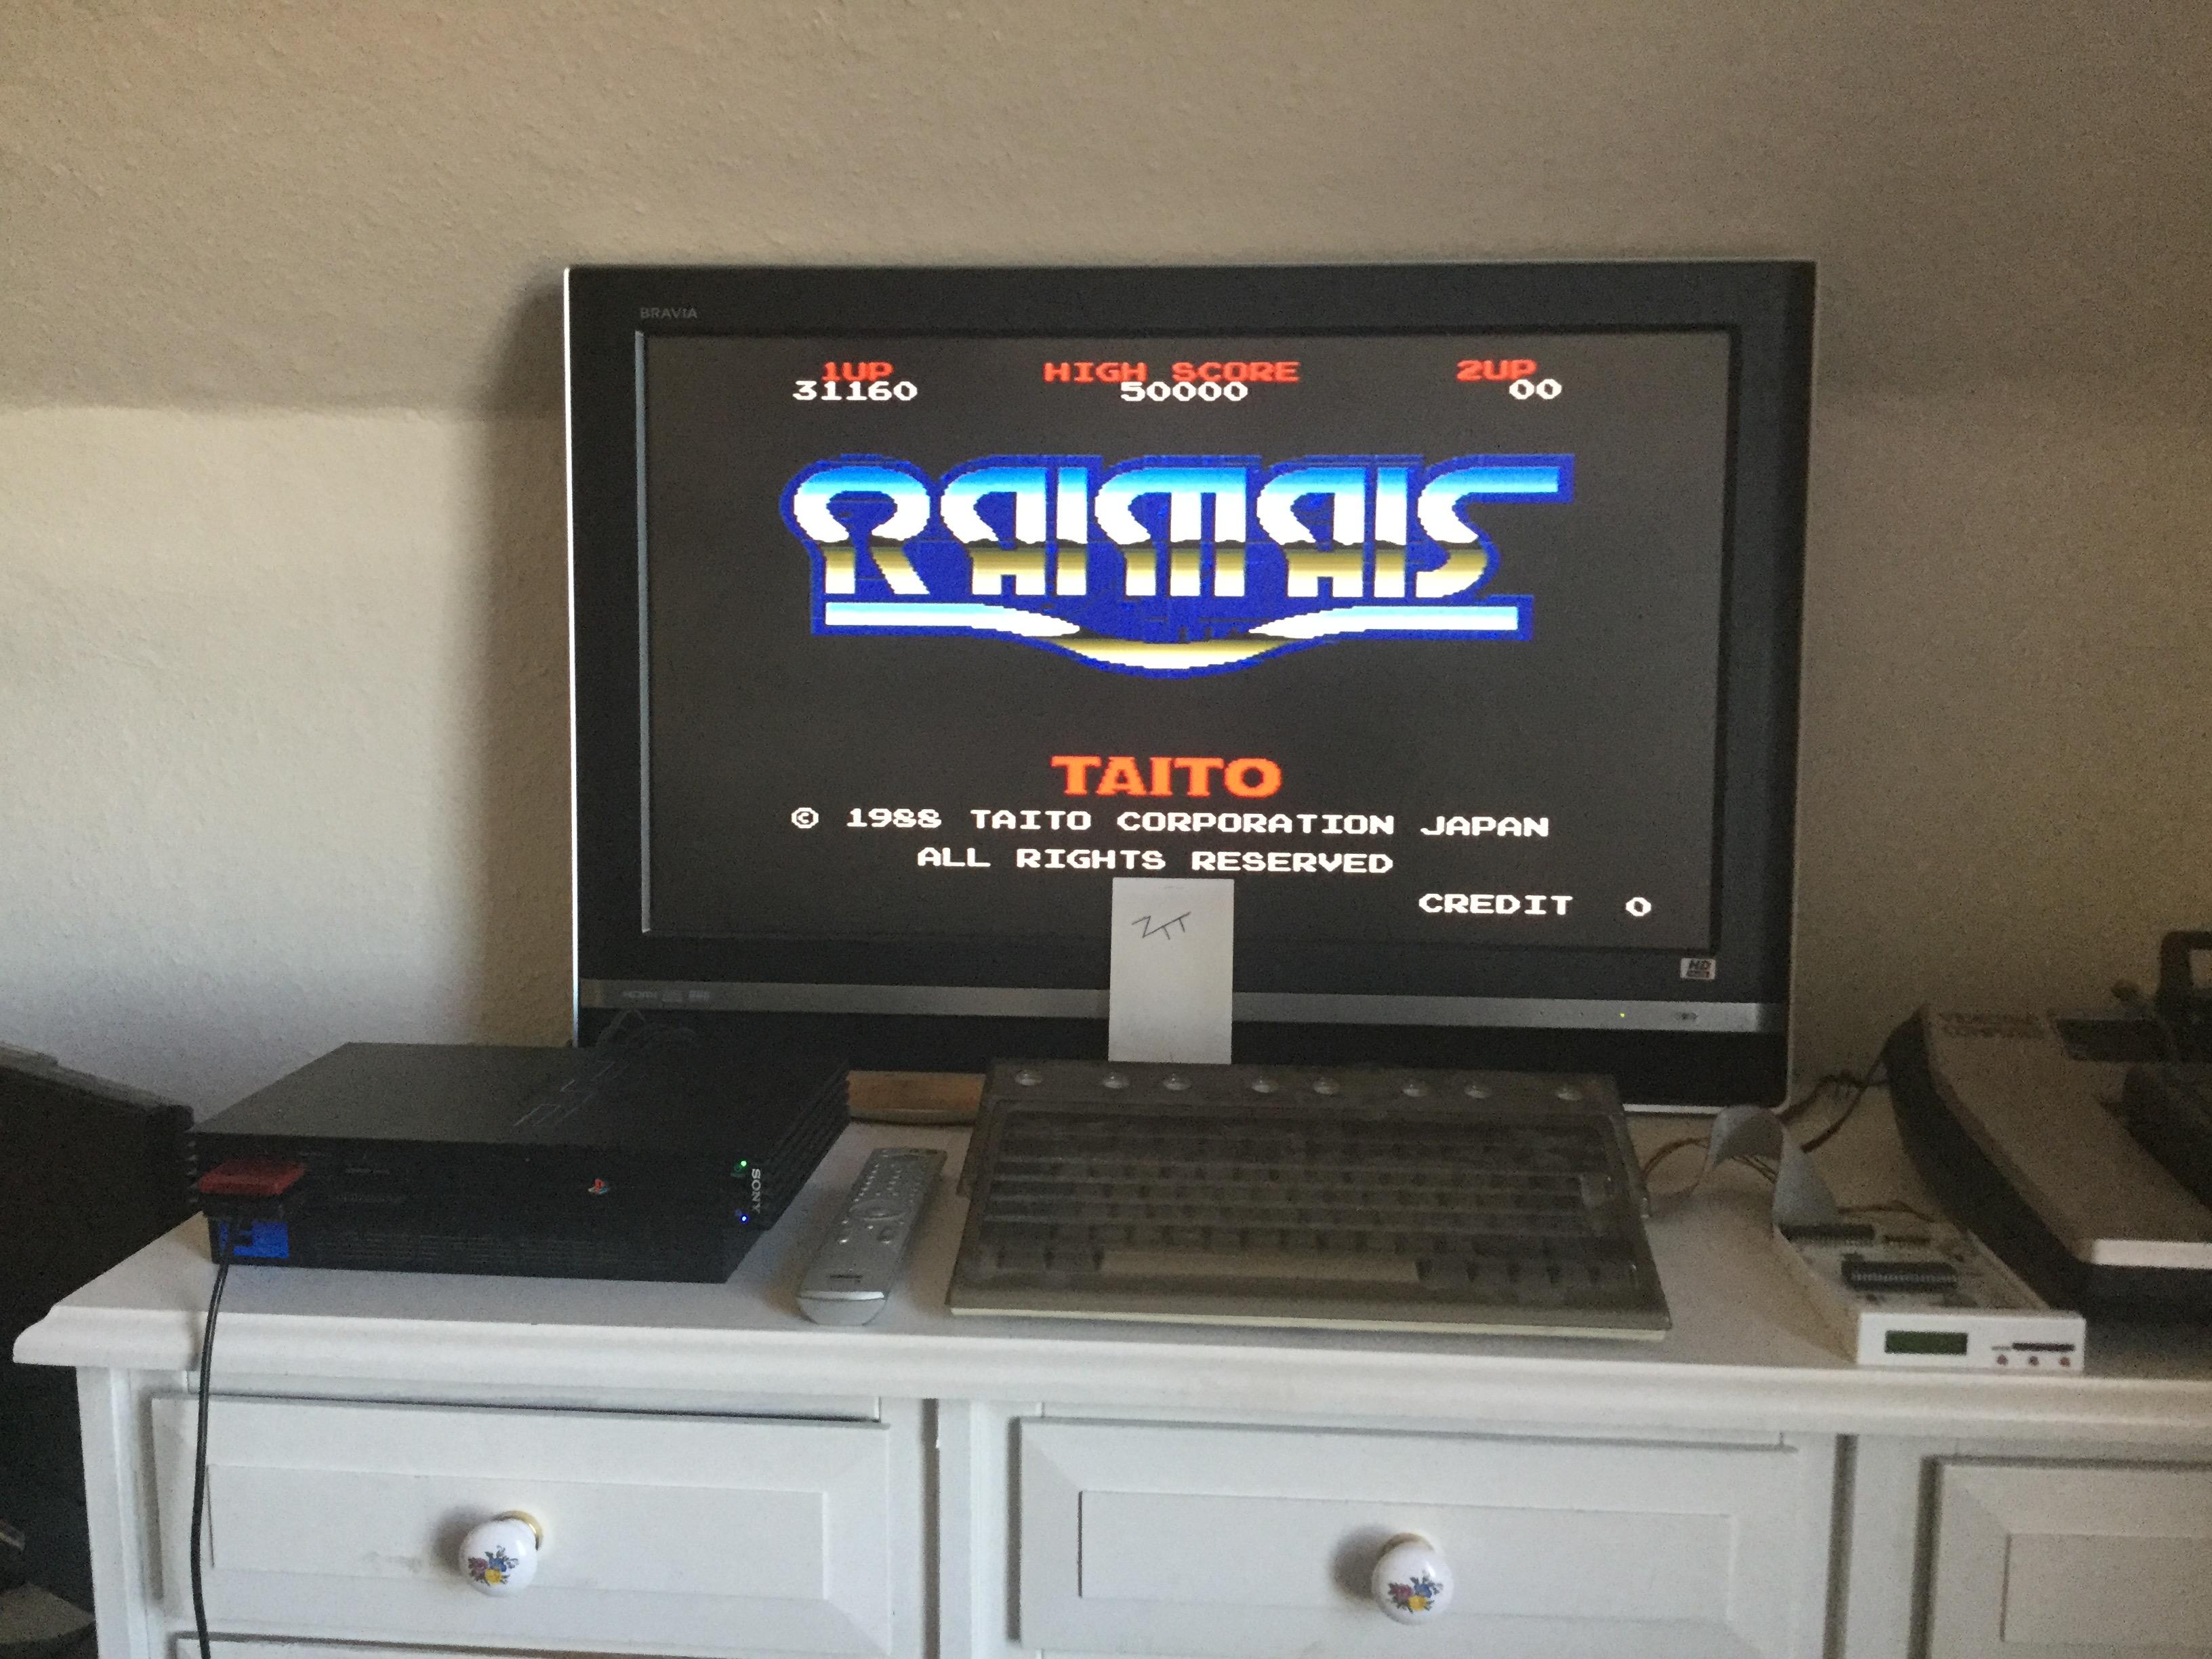 Taito Legends 2: Raimais [Medium] 39,410 points